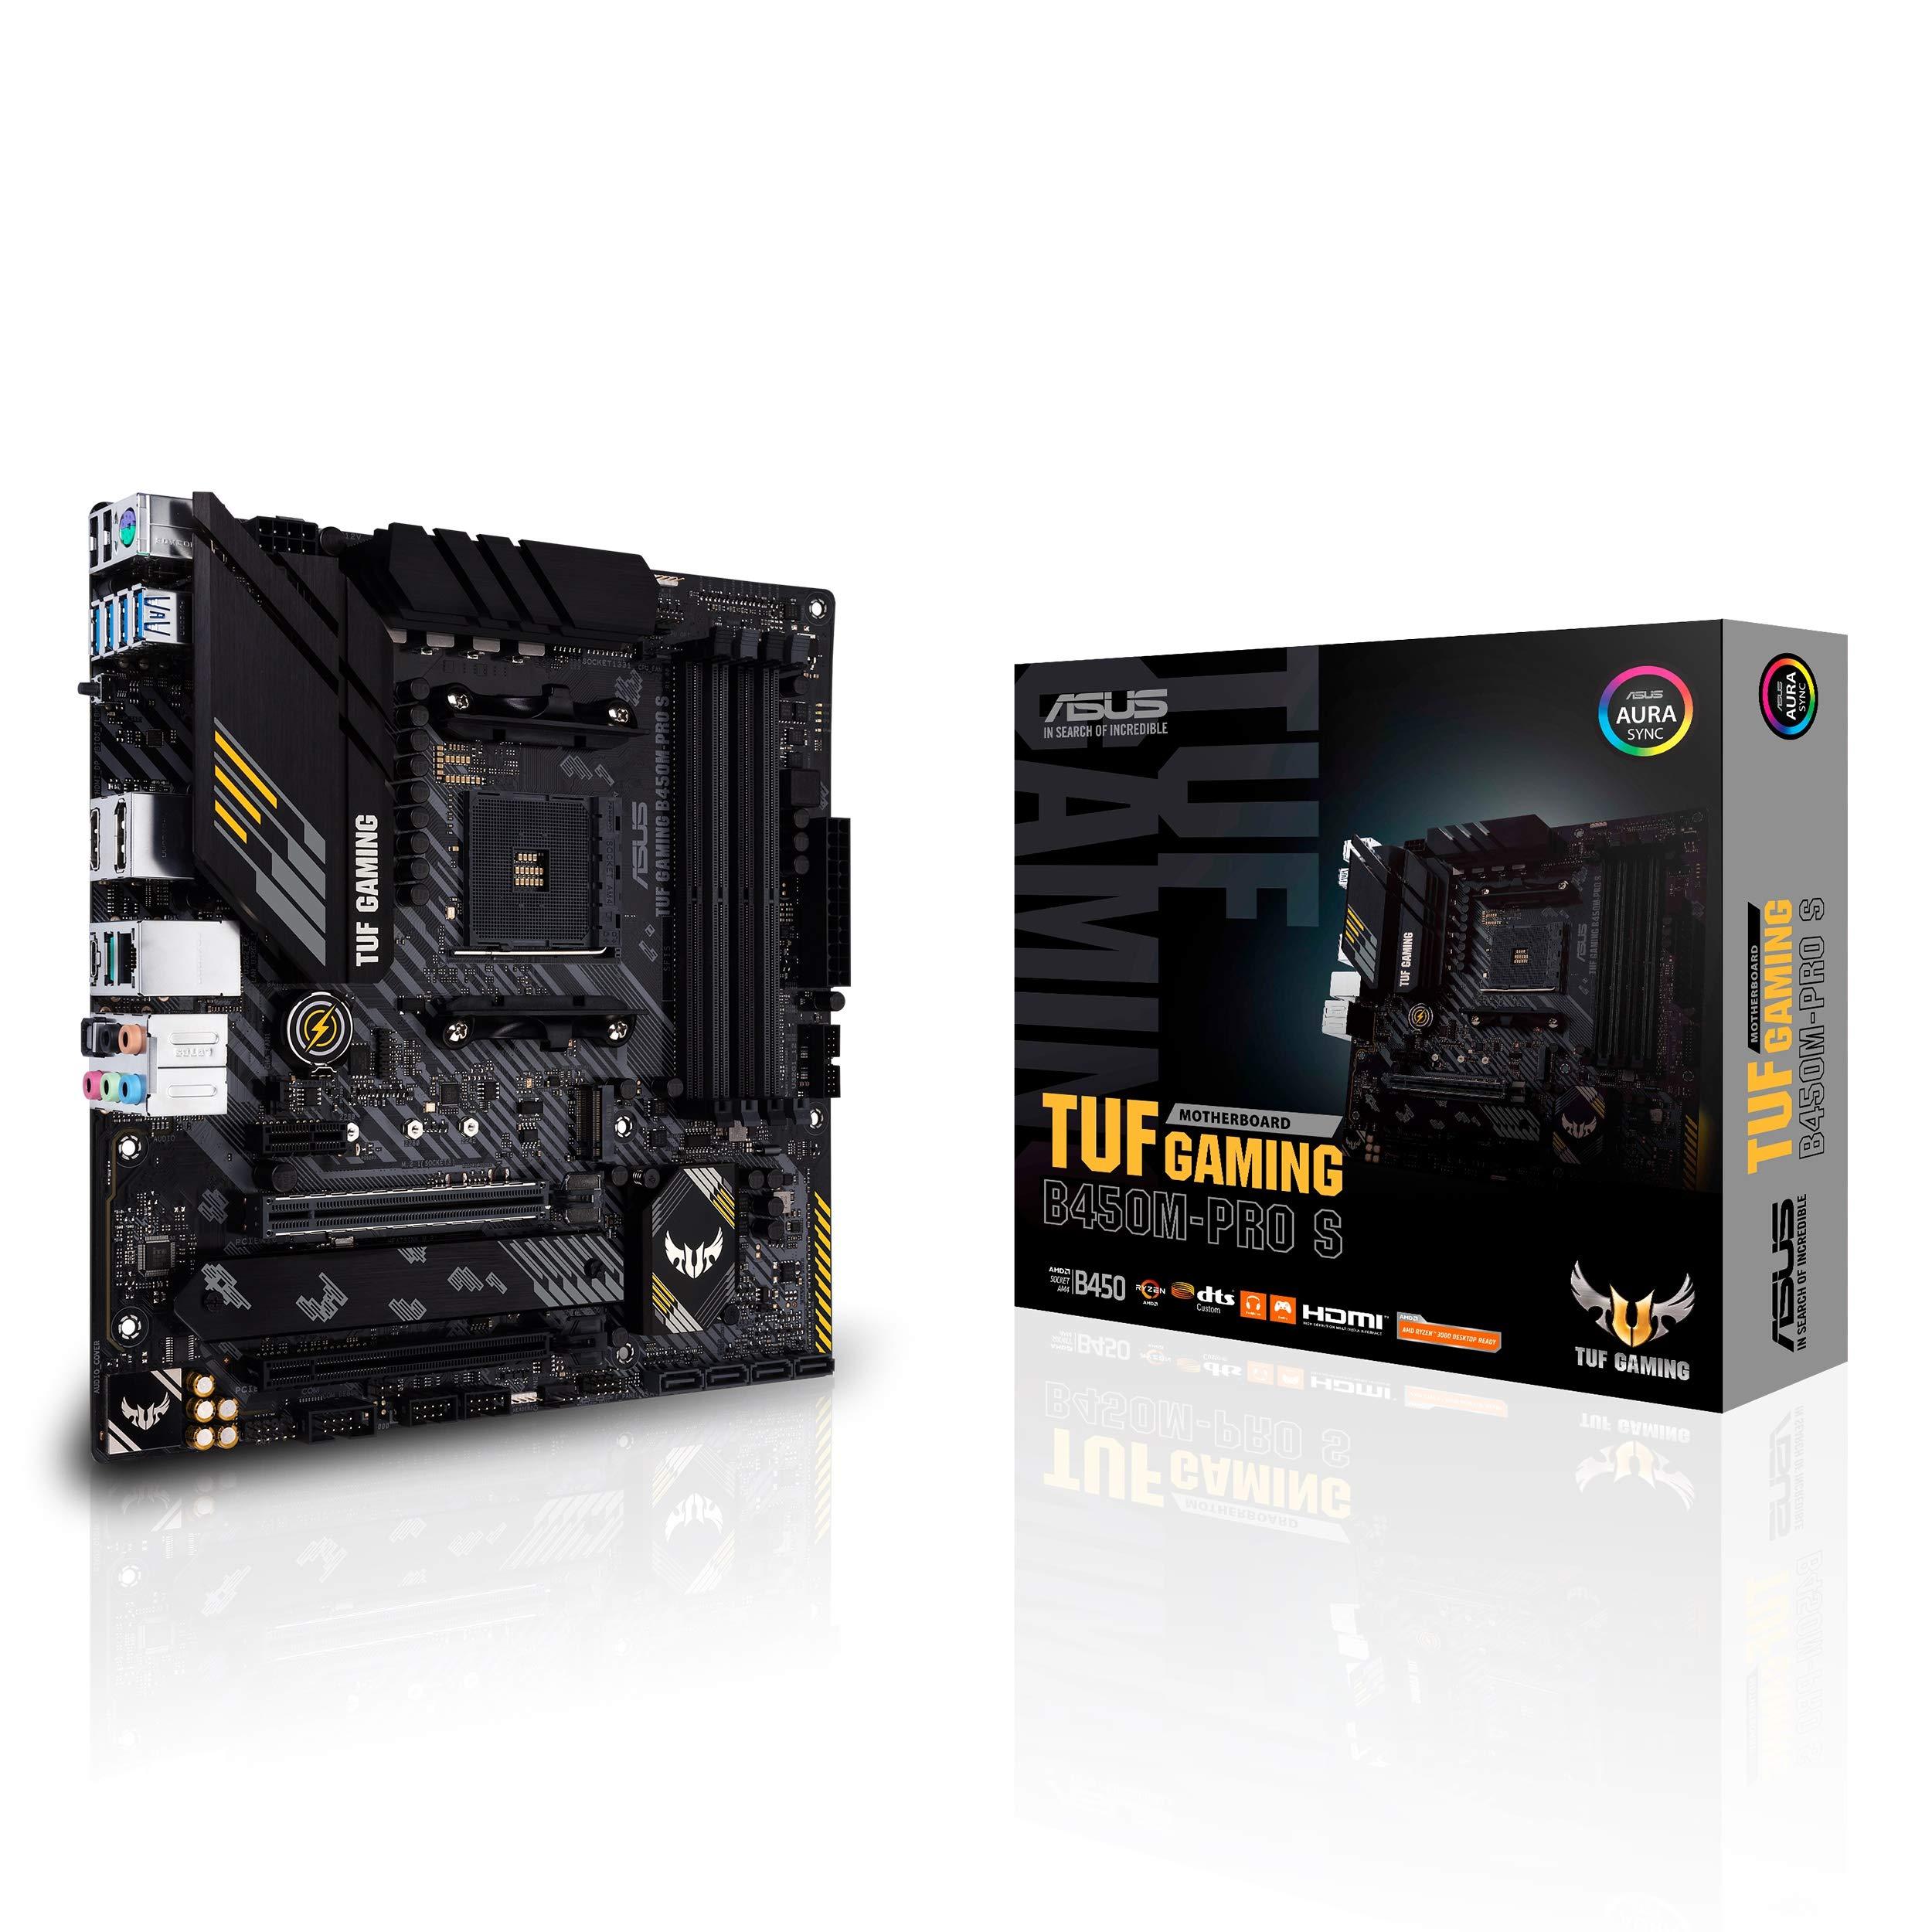 Motherboard ASUS TUF Gaming B450M-PRO S Socket AM4